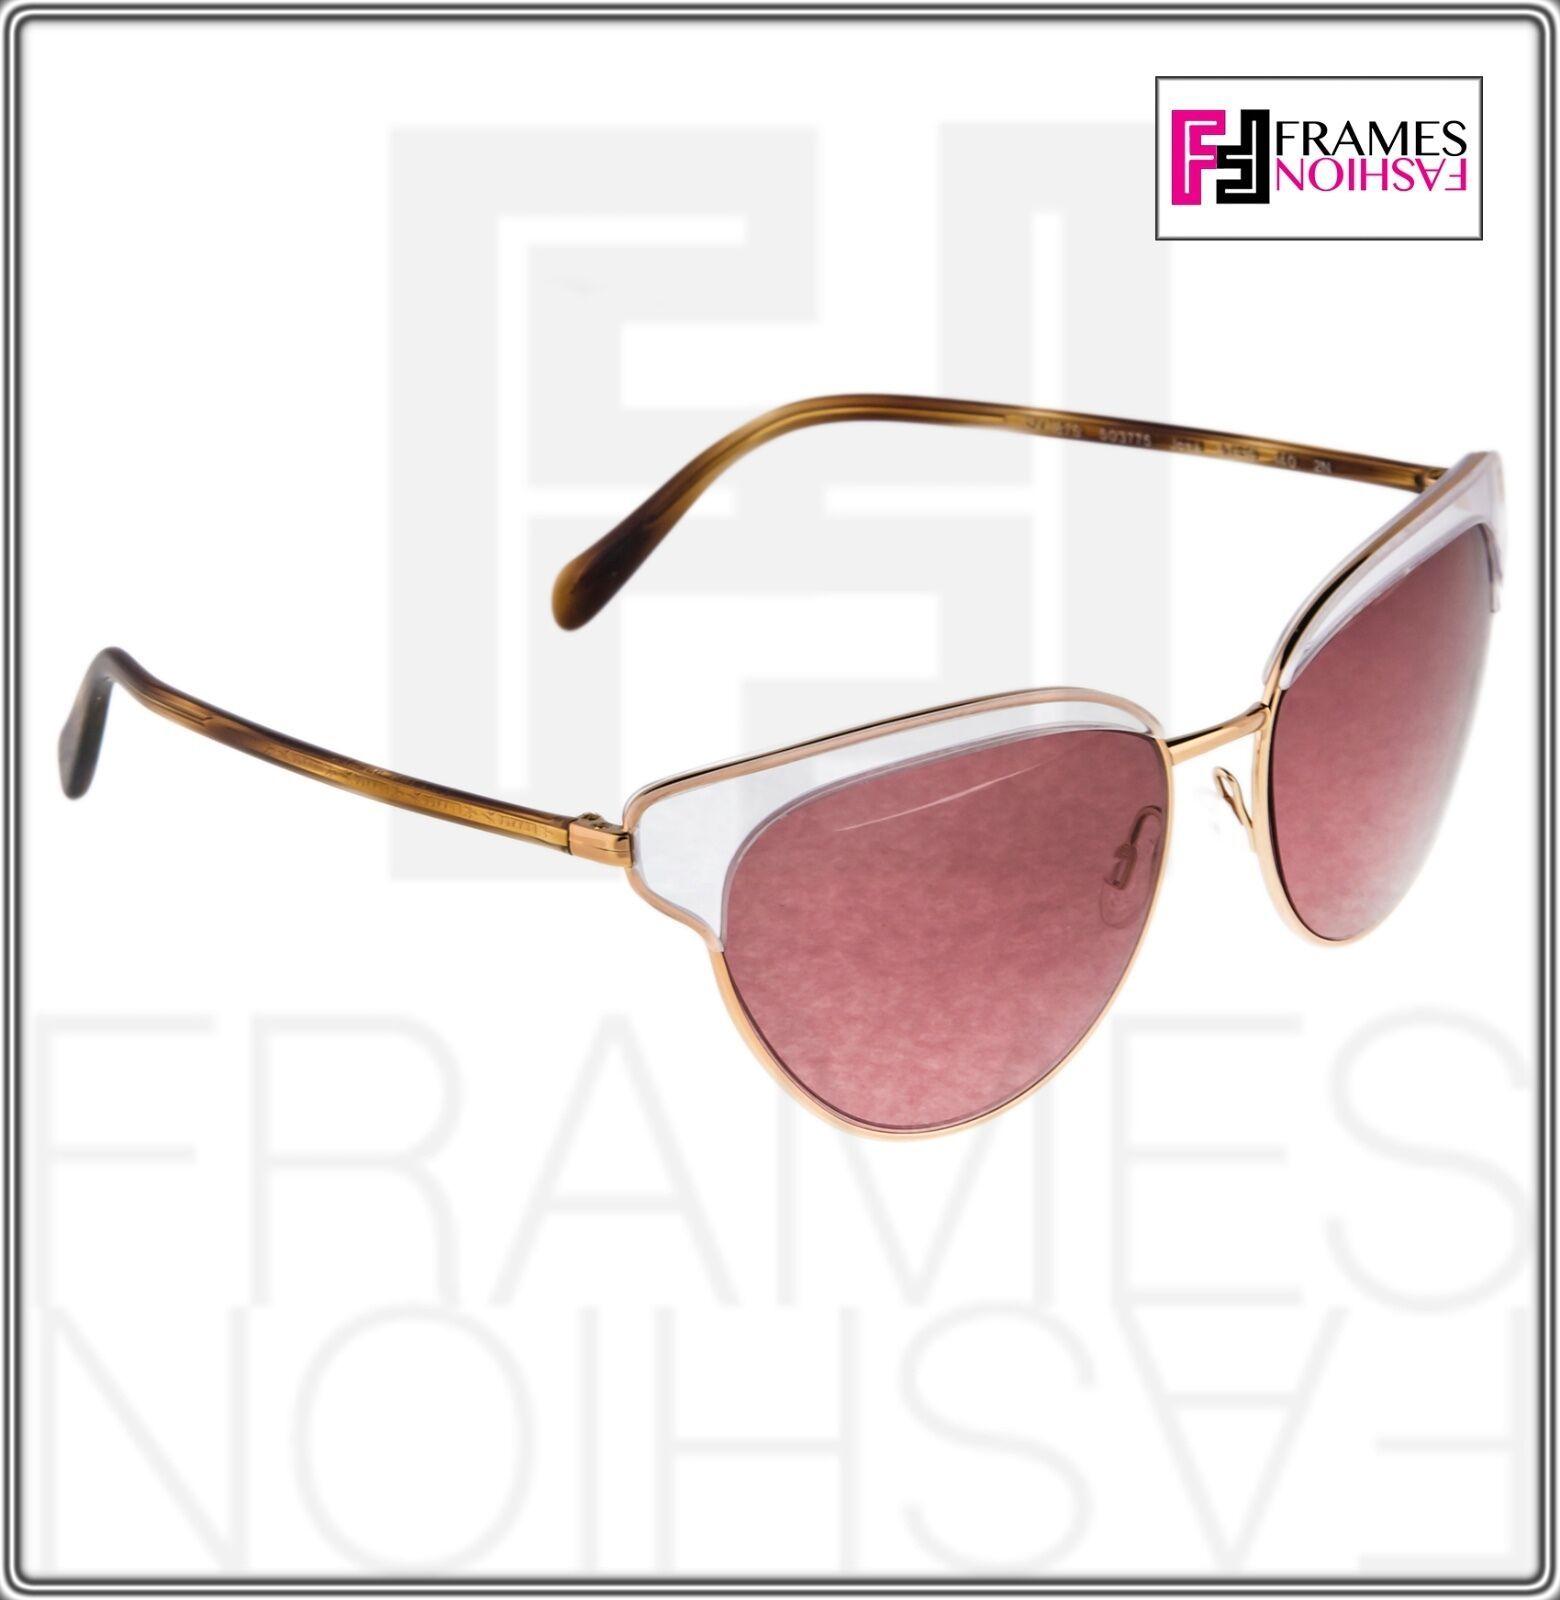 OLIVER PEOPLES JOSA OV1187S Rose Gold Pink Crystal Cat Eye Sunglasses 1187 image 7